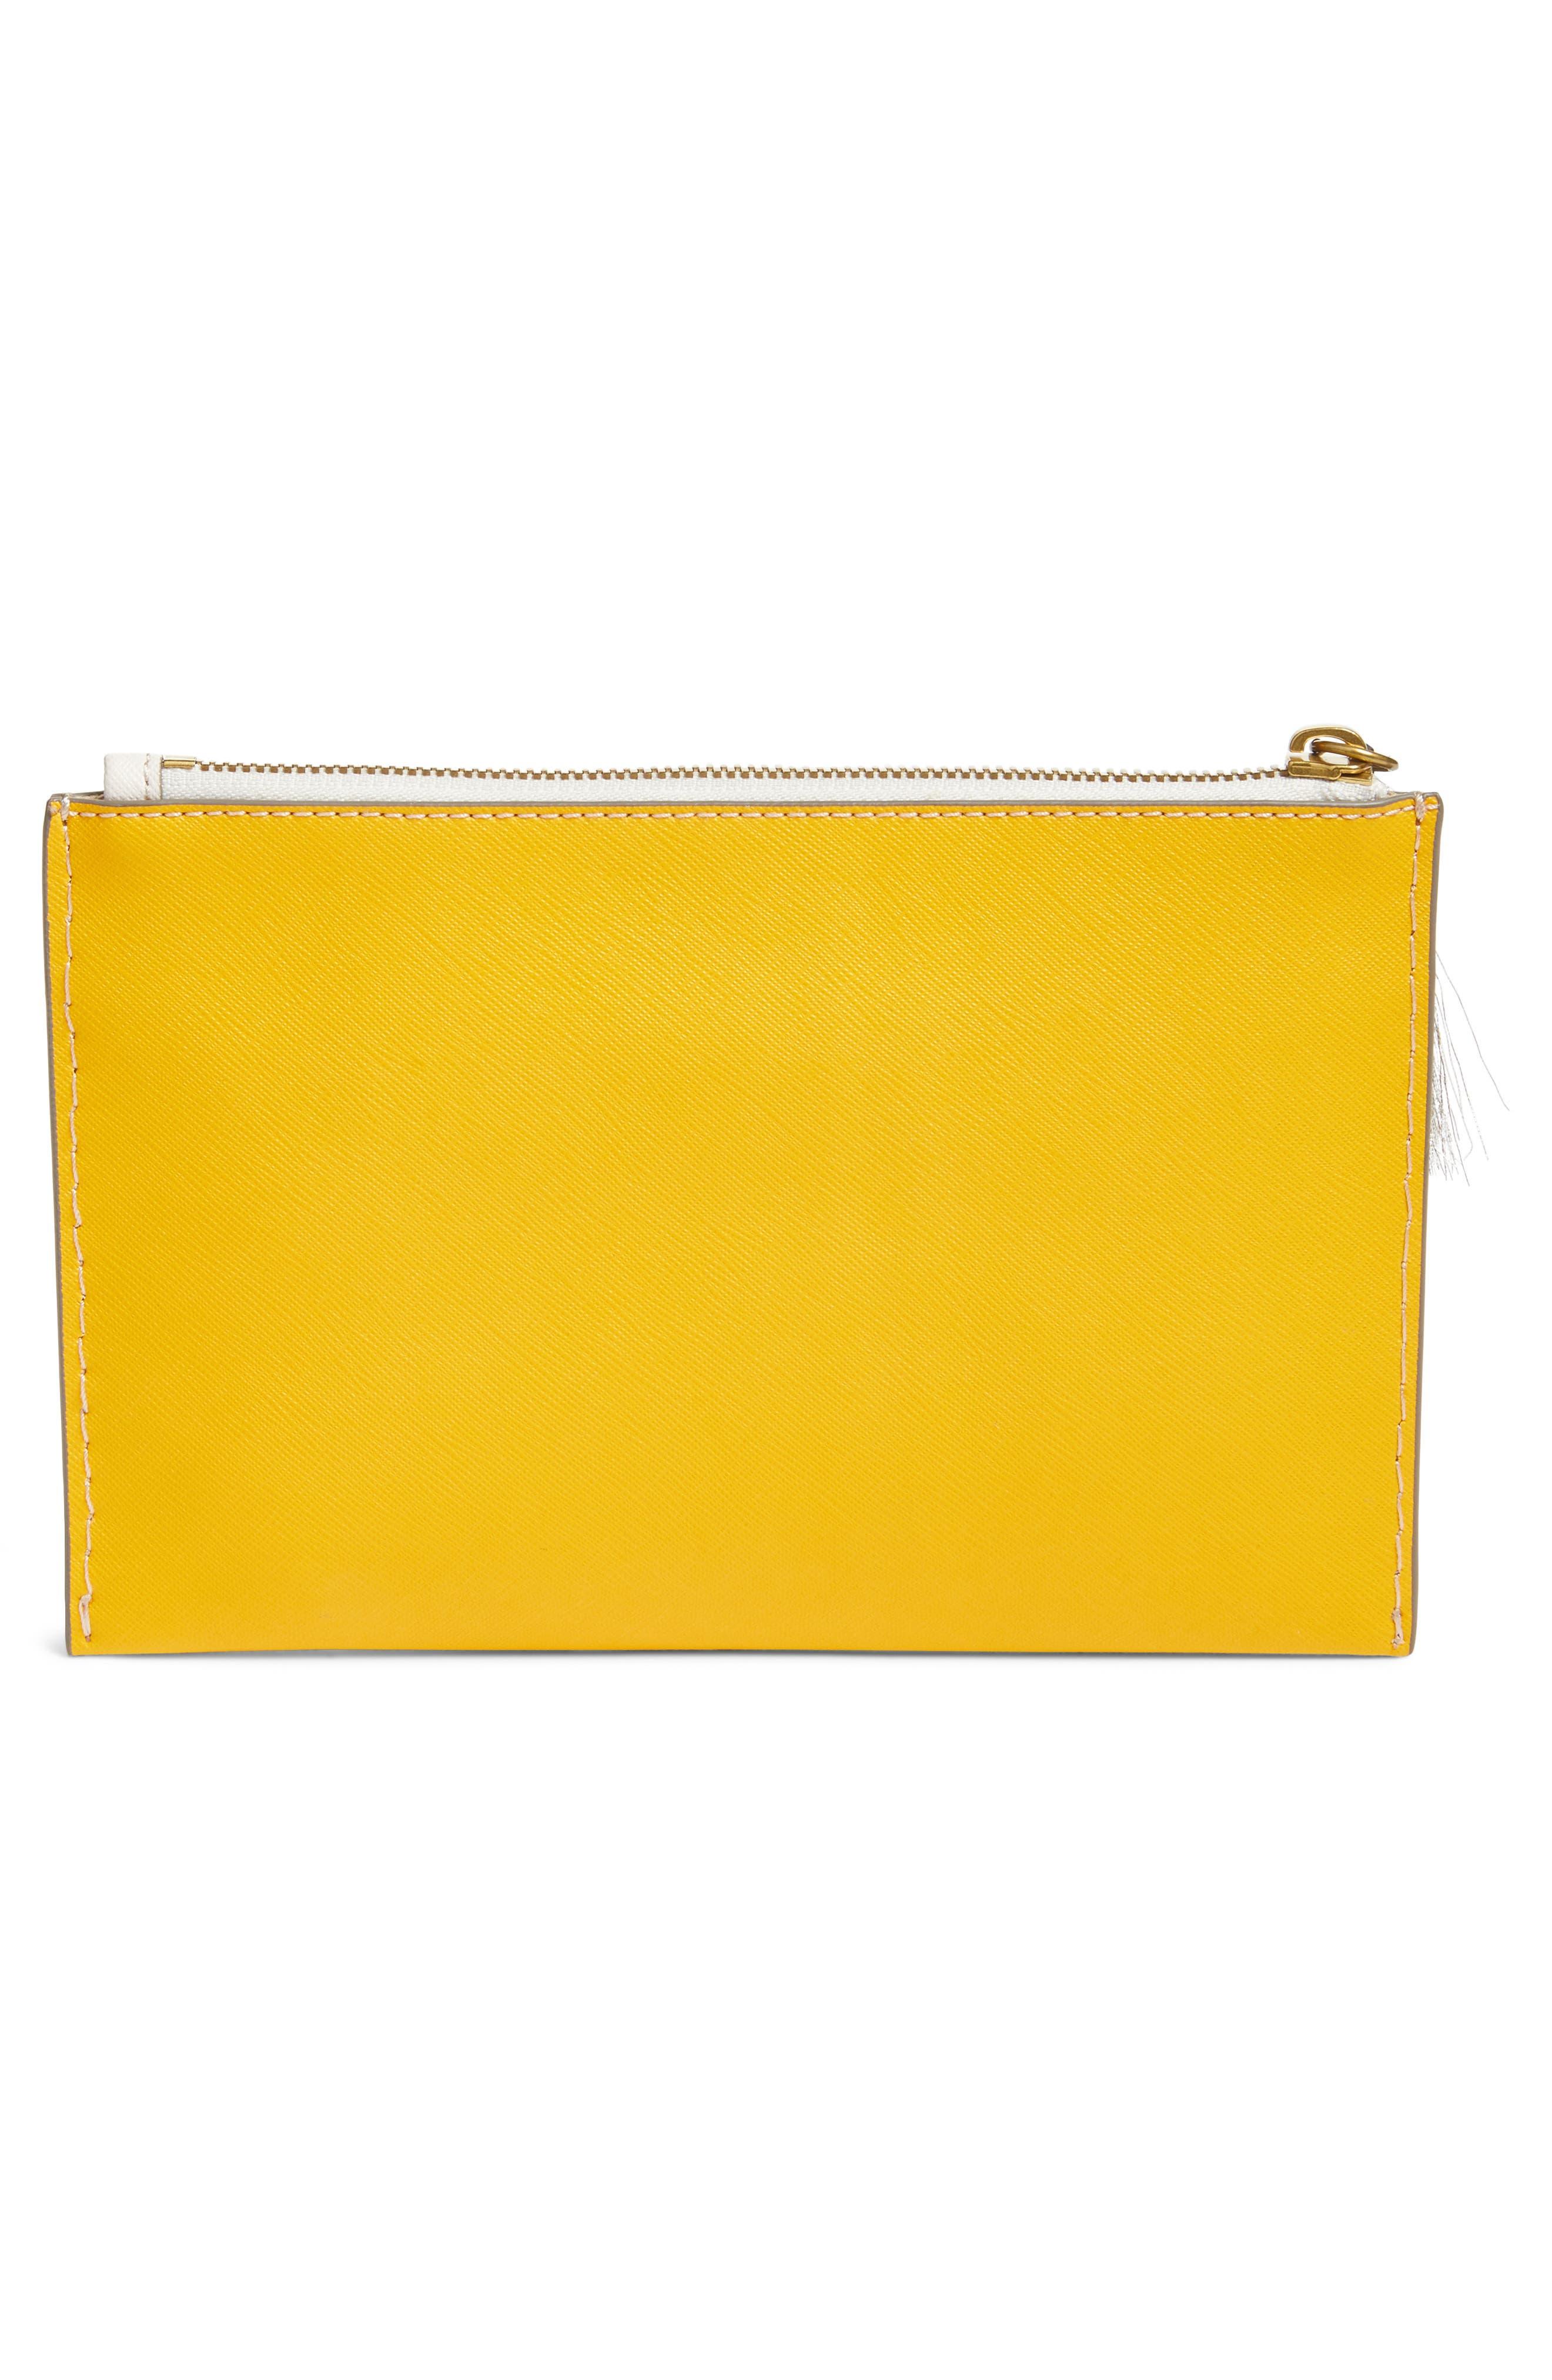 J.Crew Medium Color Block Leather Pouch,                             Alternate thumbnail 3, color,                             Sunflower Orchid